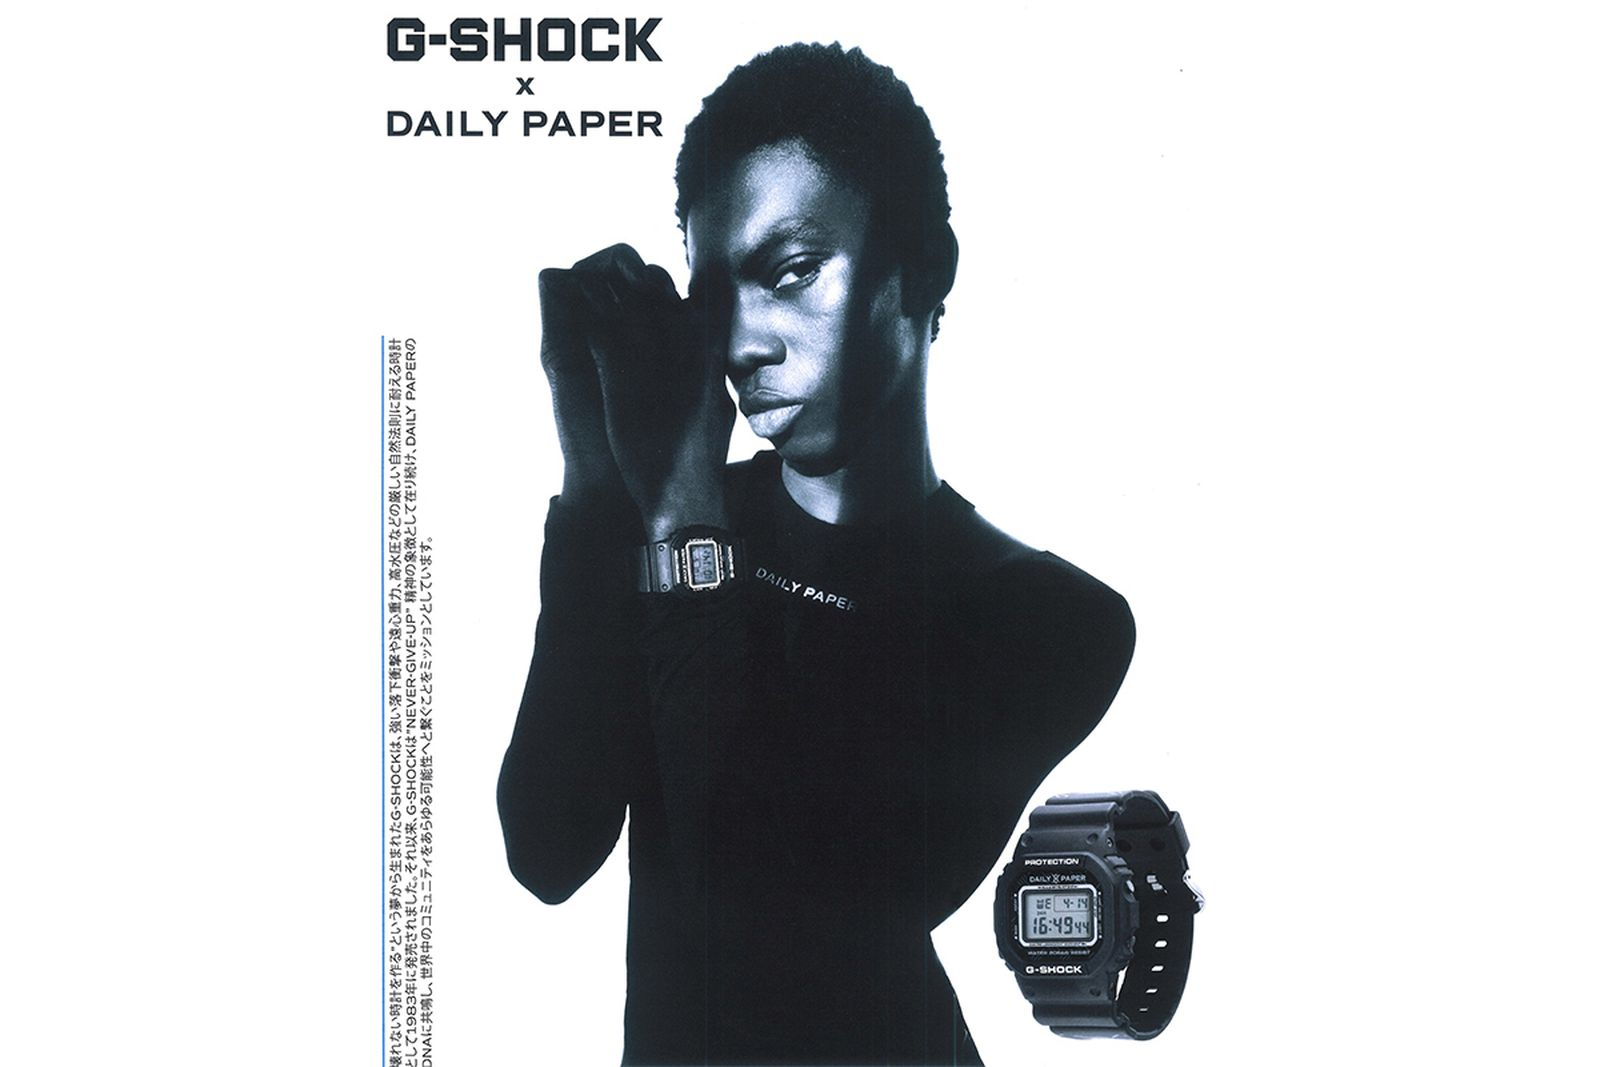 gshock-dailypaper-4